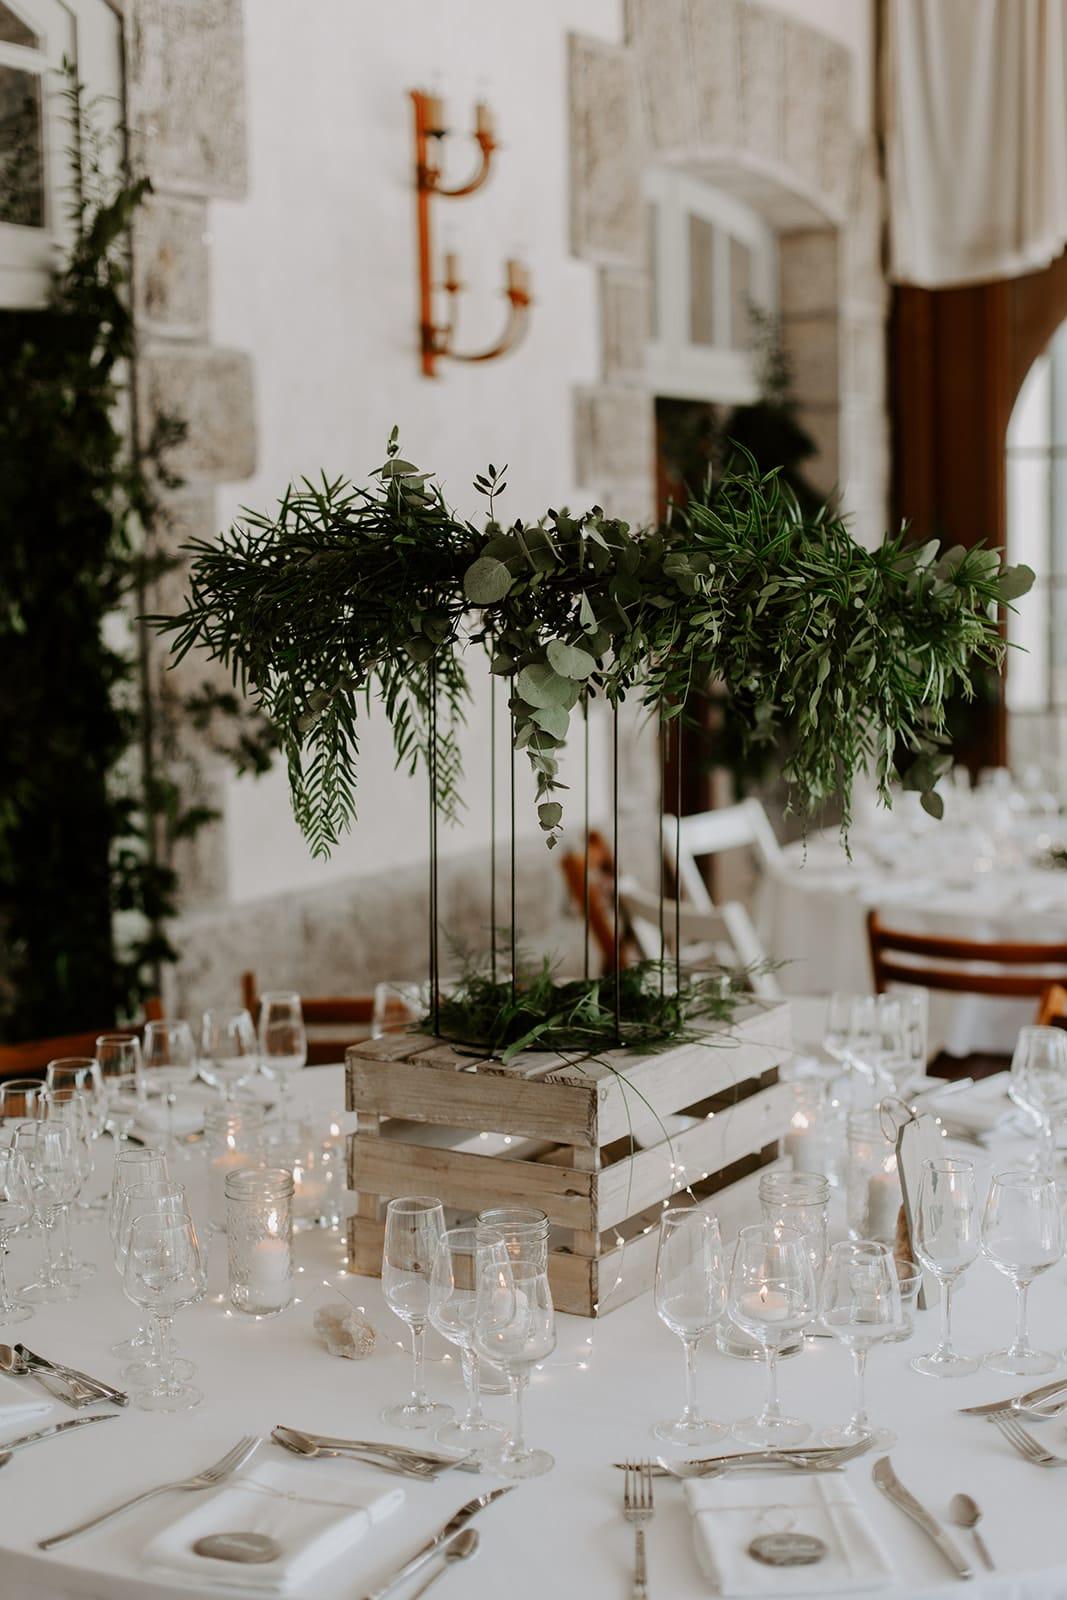 mariage_chateau_la_flocelliere_vendee_flavie_nelly_photographe-46-obonheurdesdames-decoration-mariage-location-vegetal